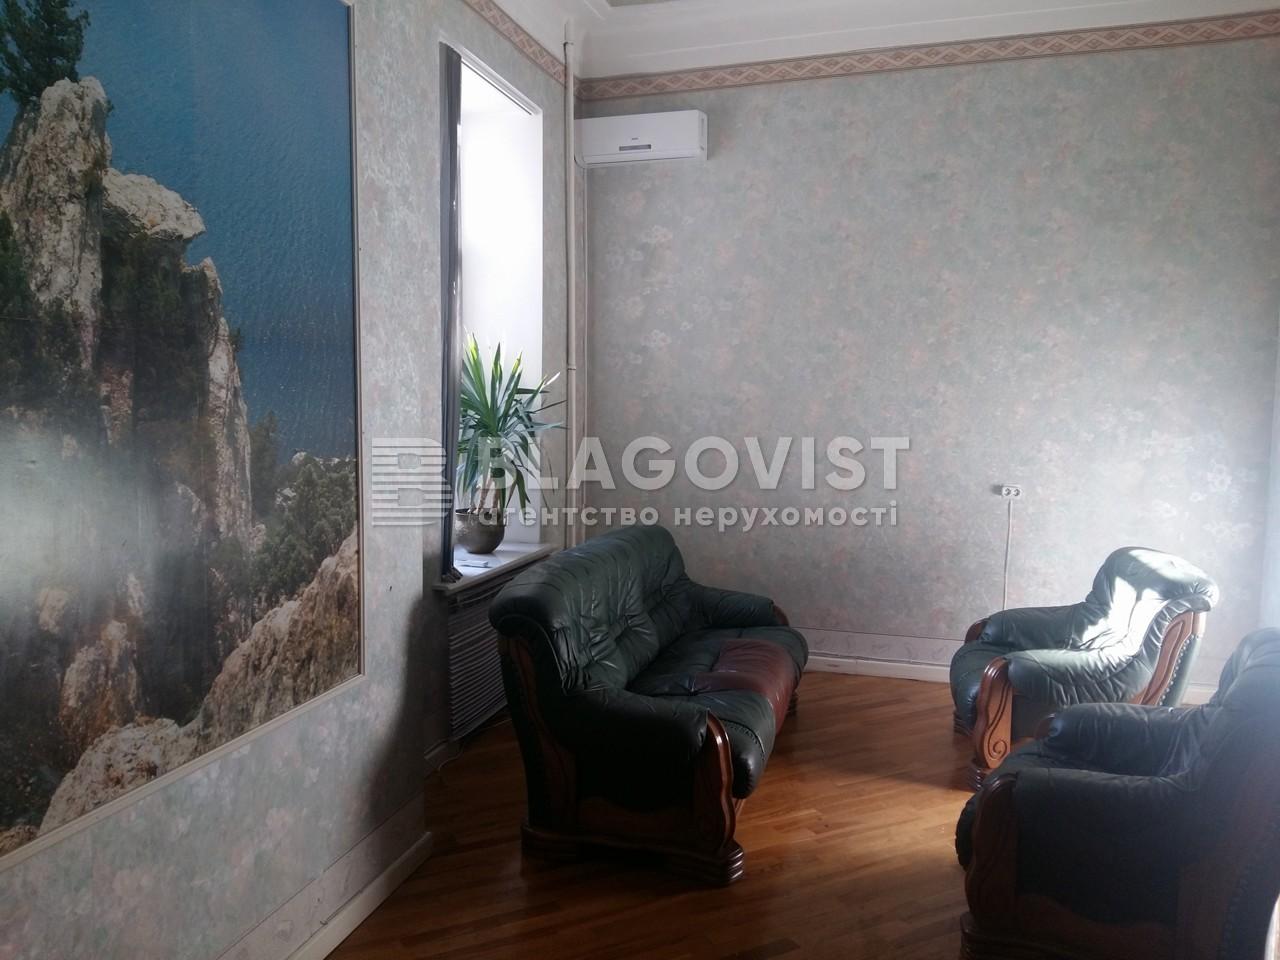 Квартира E-14530, Антоновича (Горького), 10, Киев - Фото 7